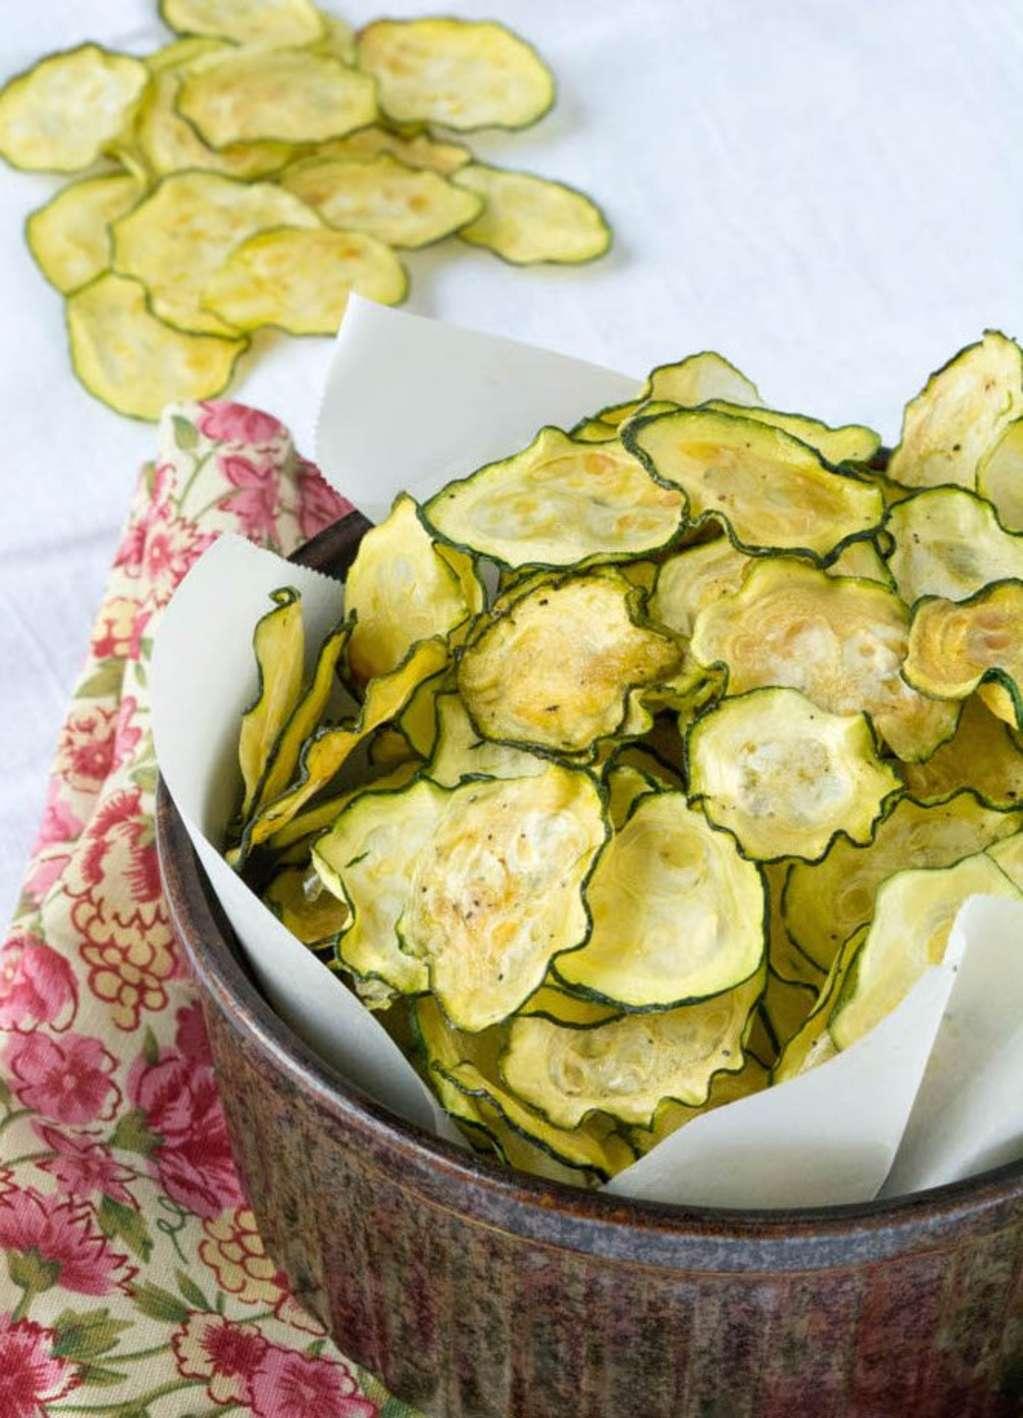 DIY Salt and Vinegar Chips Get a Healthy, Seasonal Twist